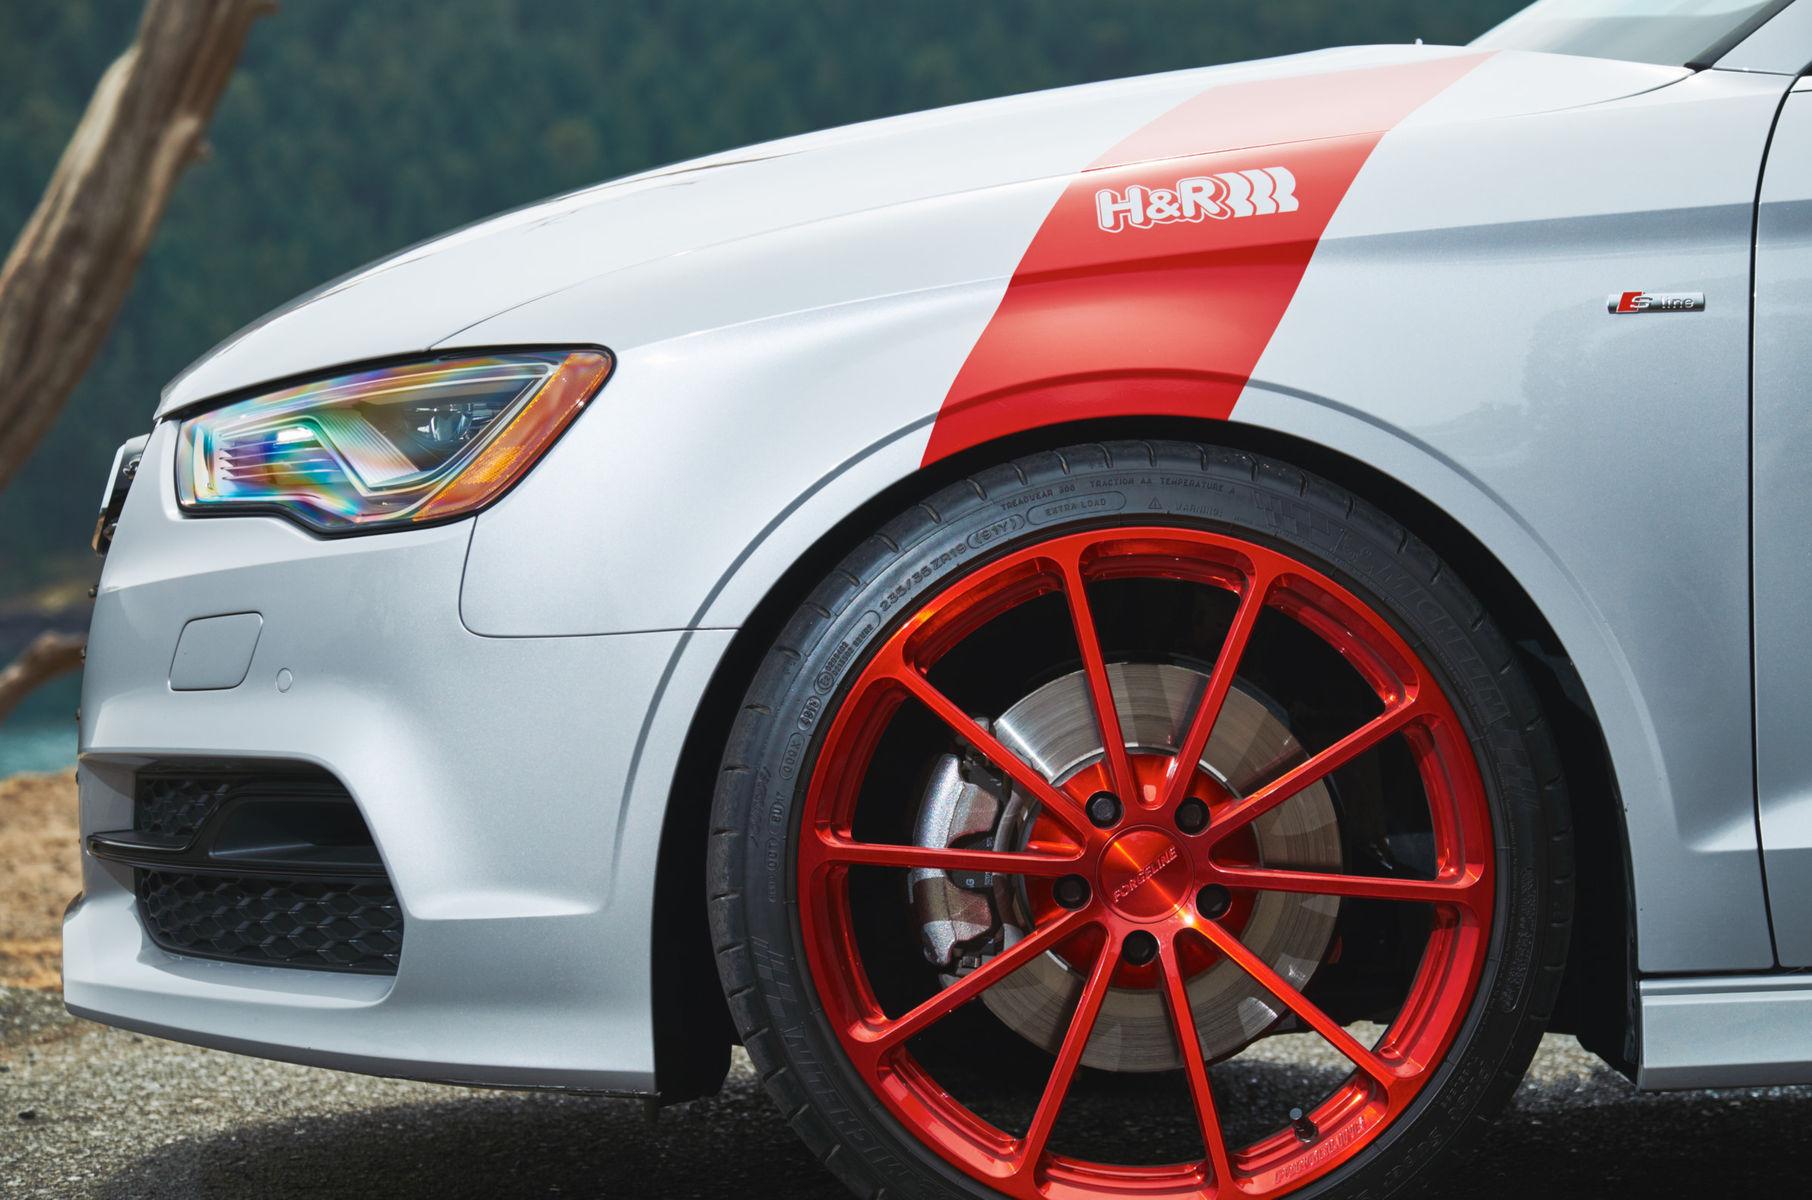 2015 Audi A3 | Audi A3 on Forgeline GT1 5-Lug Wheels